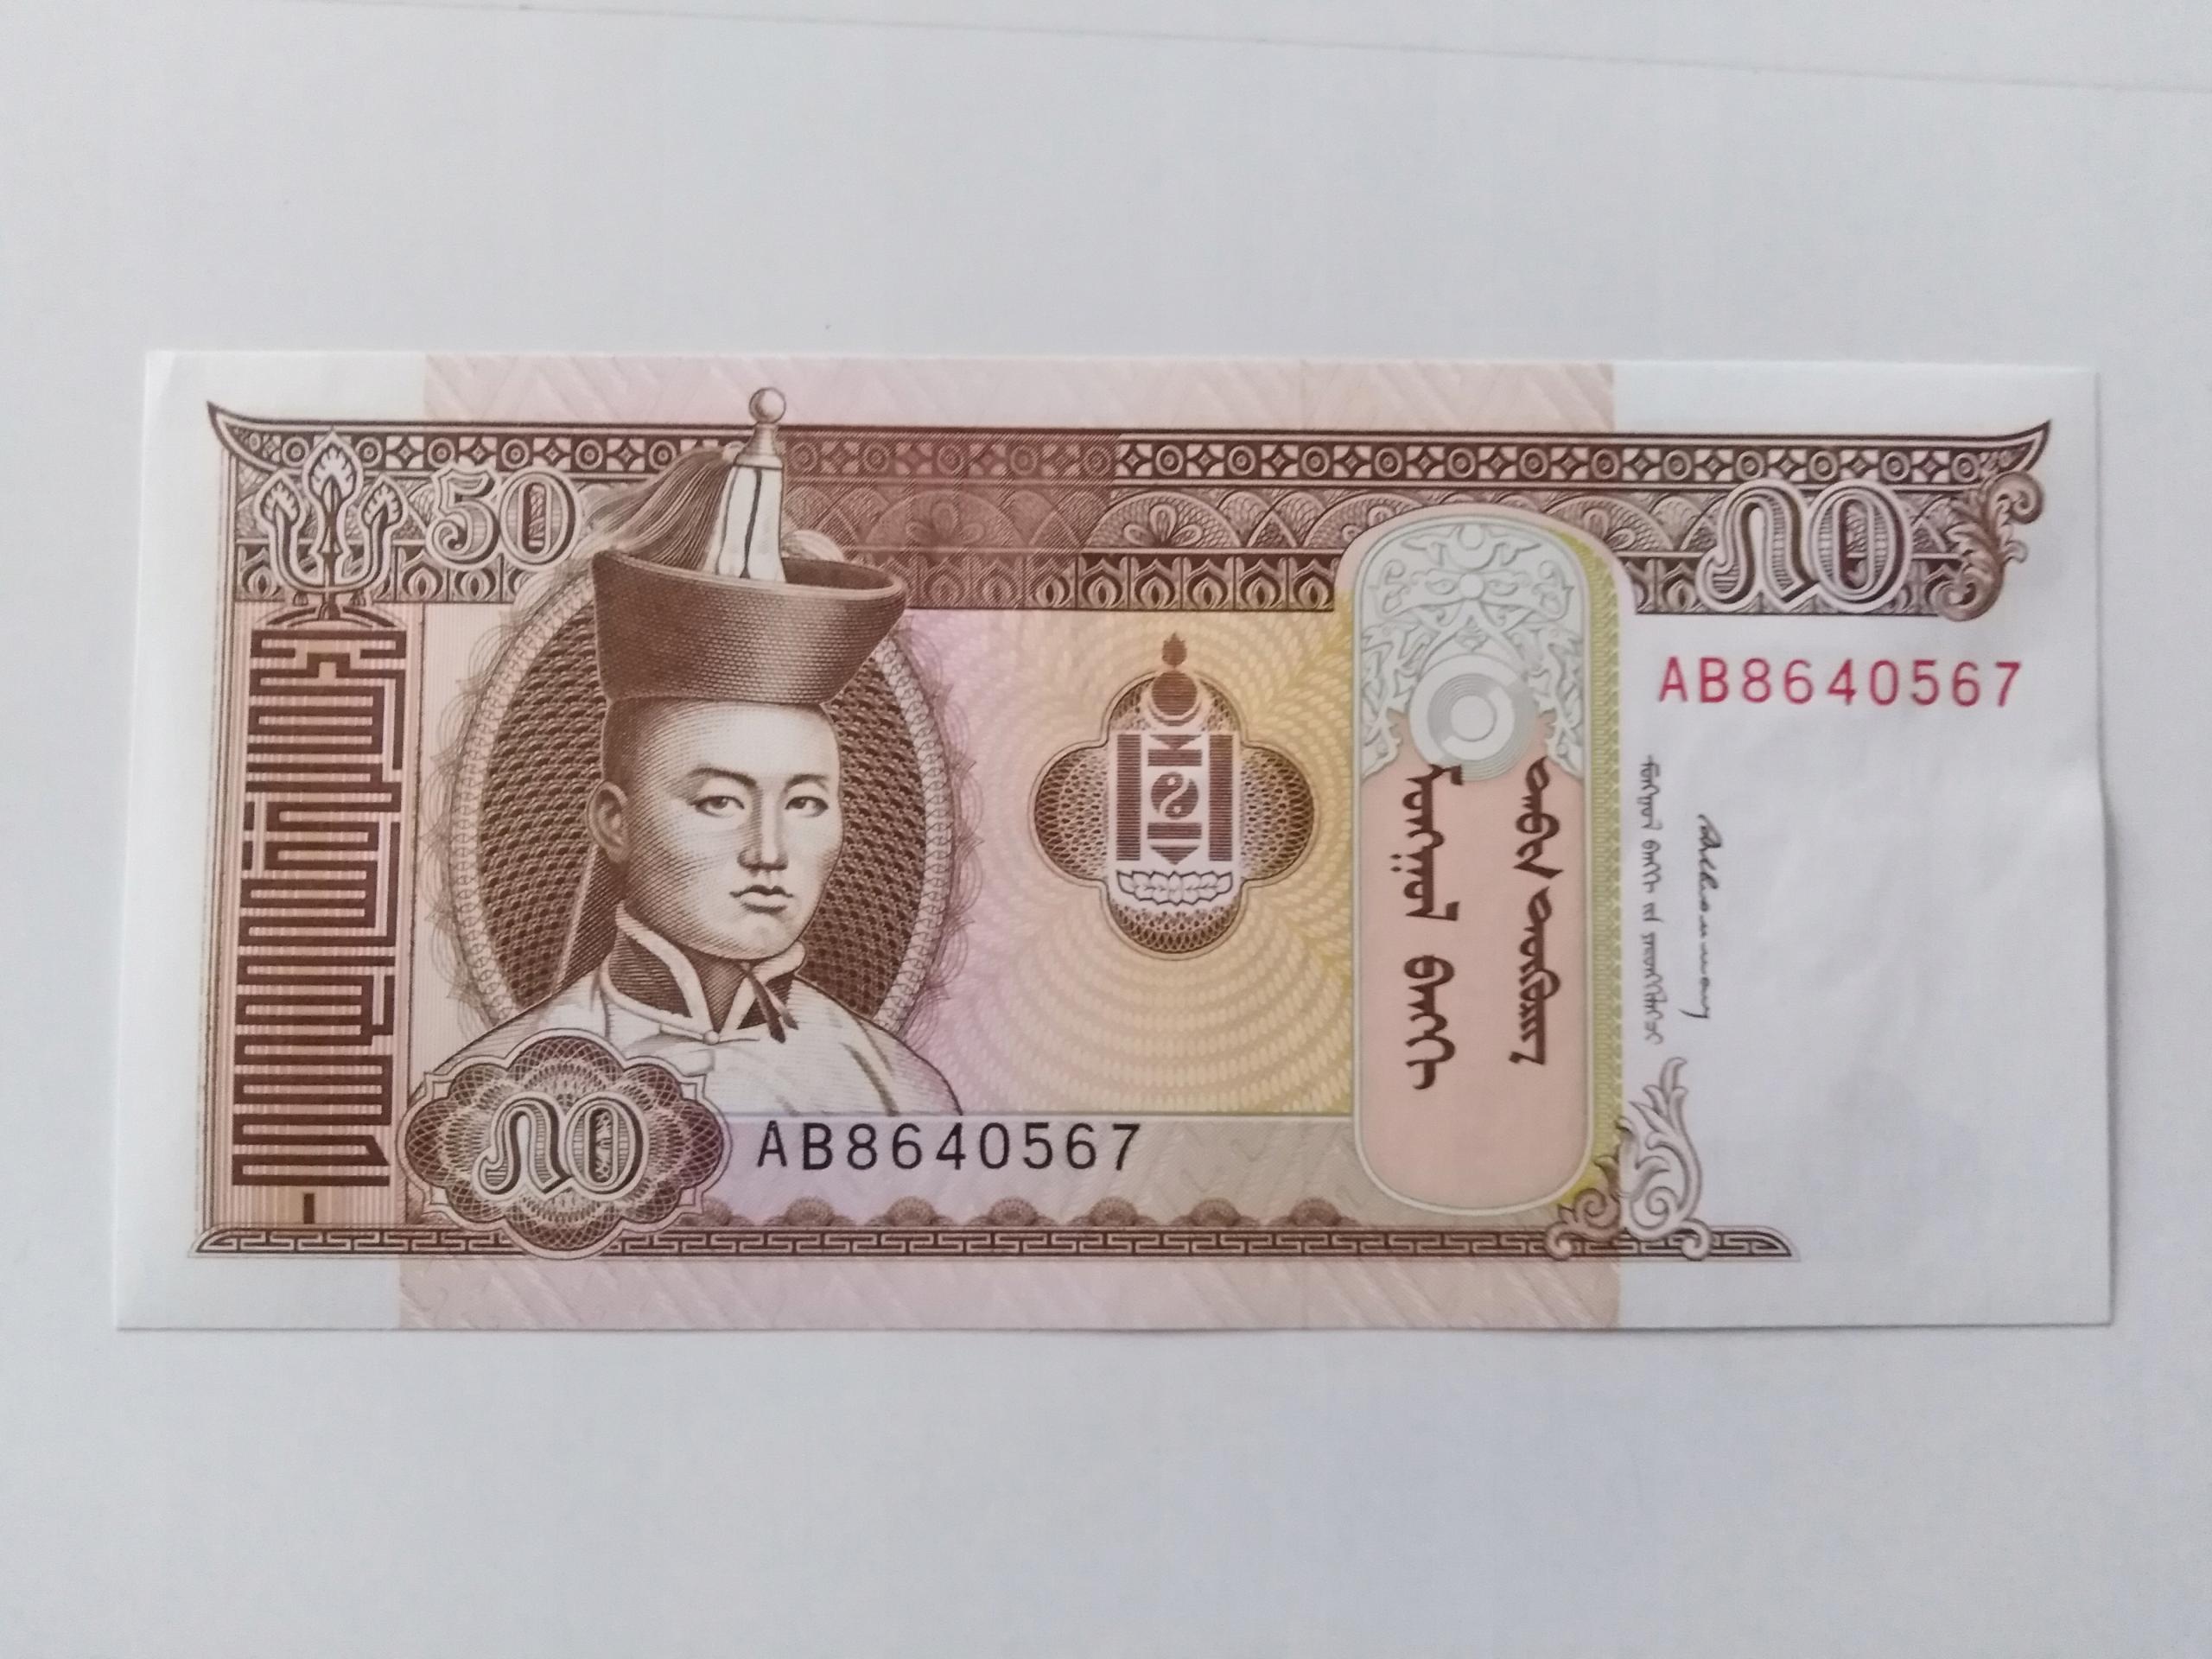 MONGOLIA 50 TUGRIK (1993) P56 (0-3064)